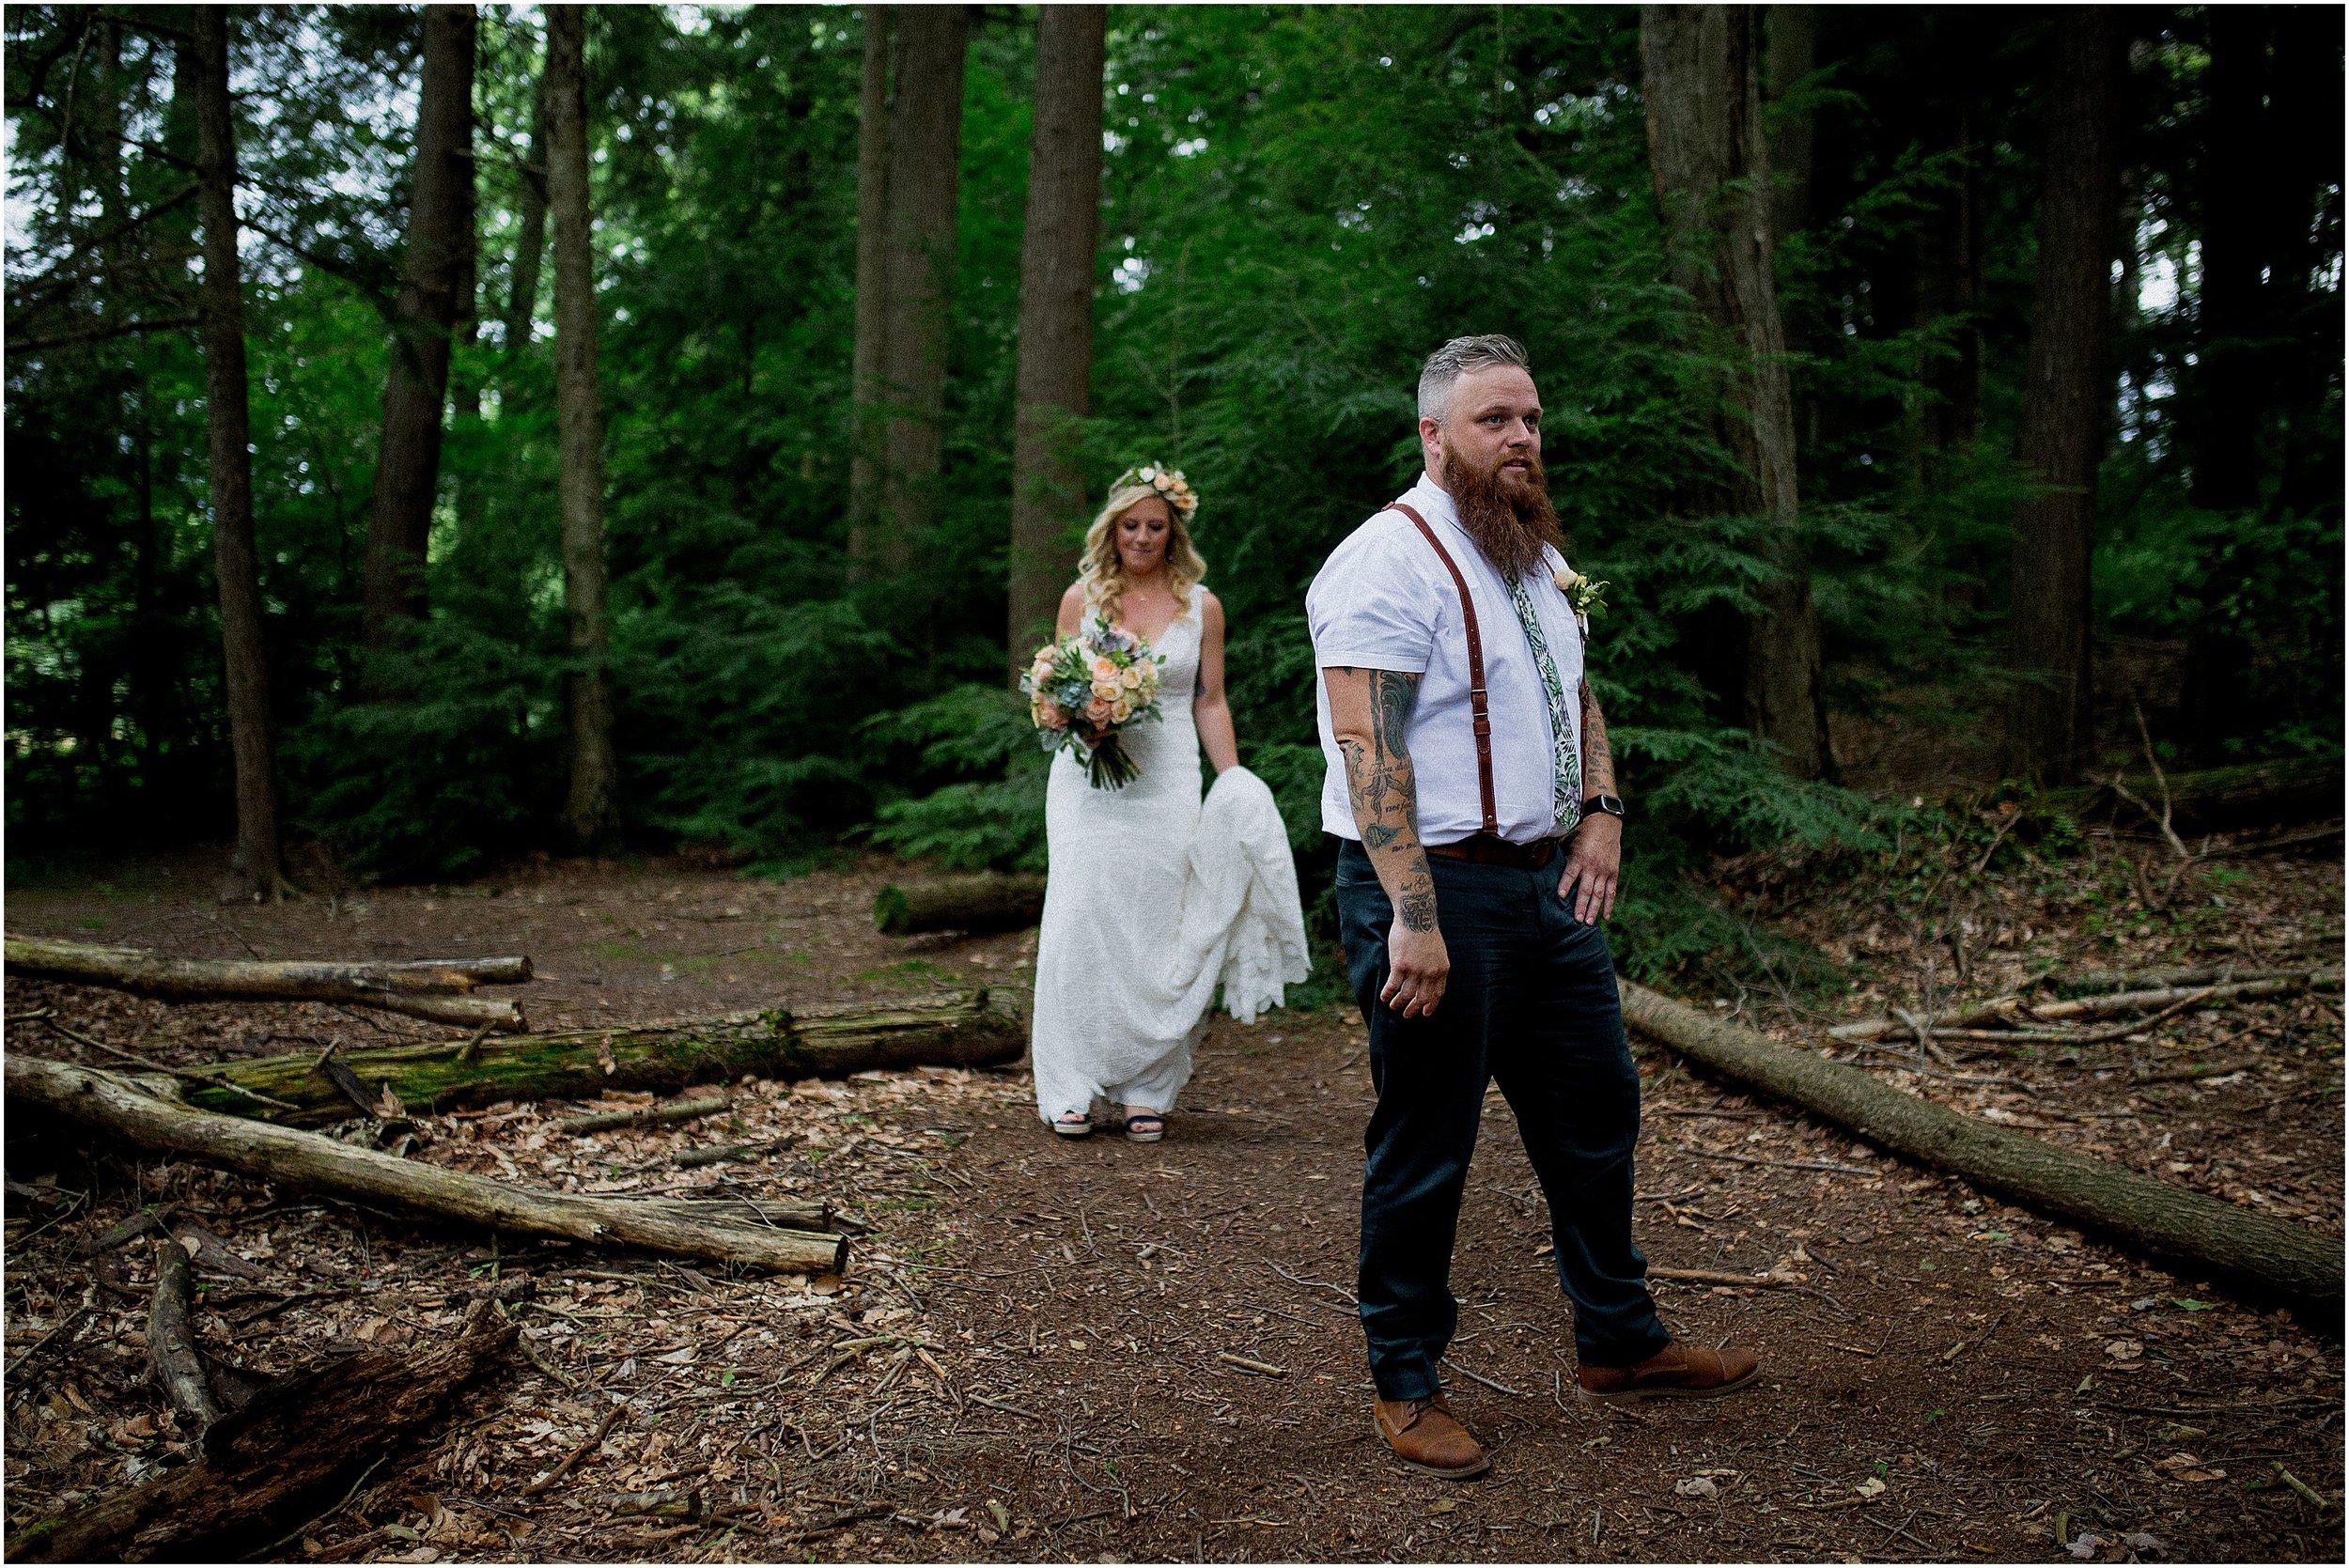 Rose_Valley_Lake_Wedding_Photographer_0030.jpg